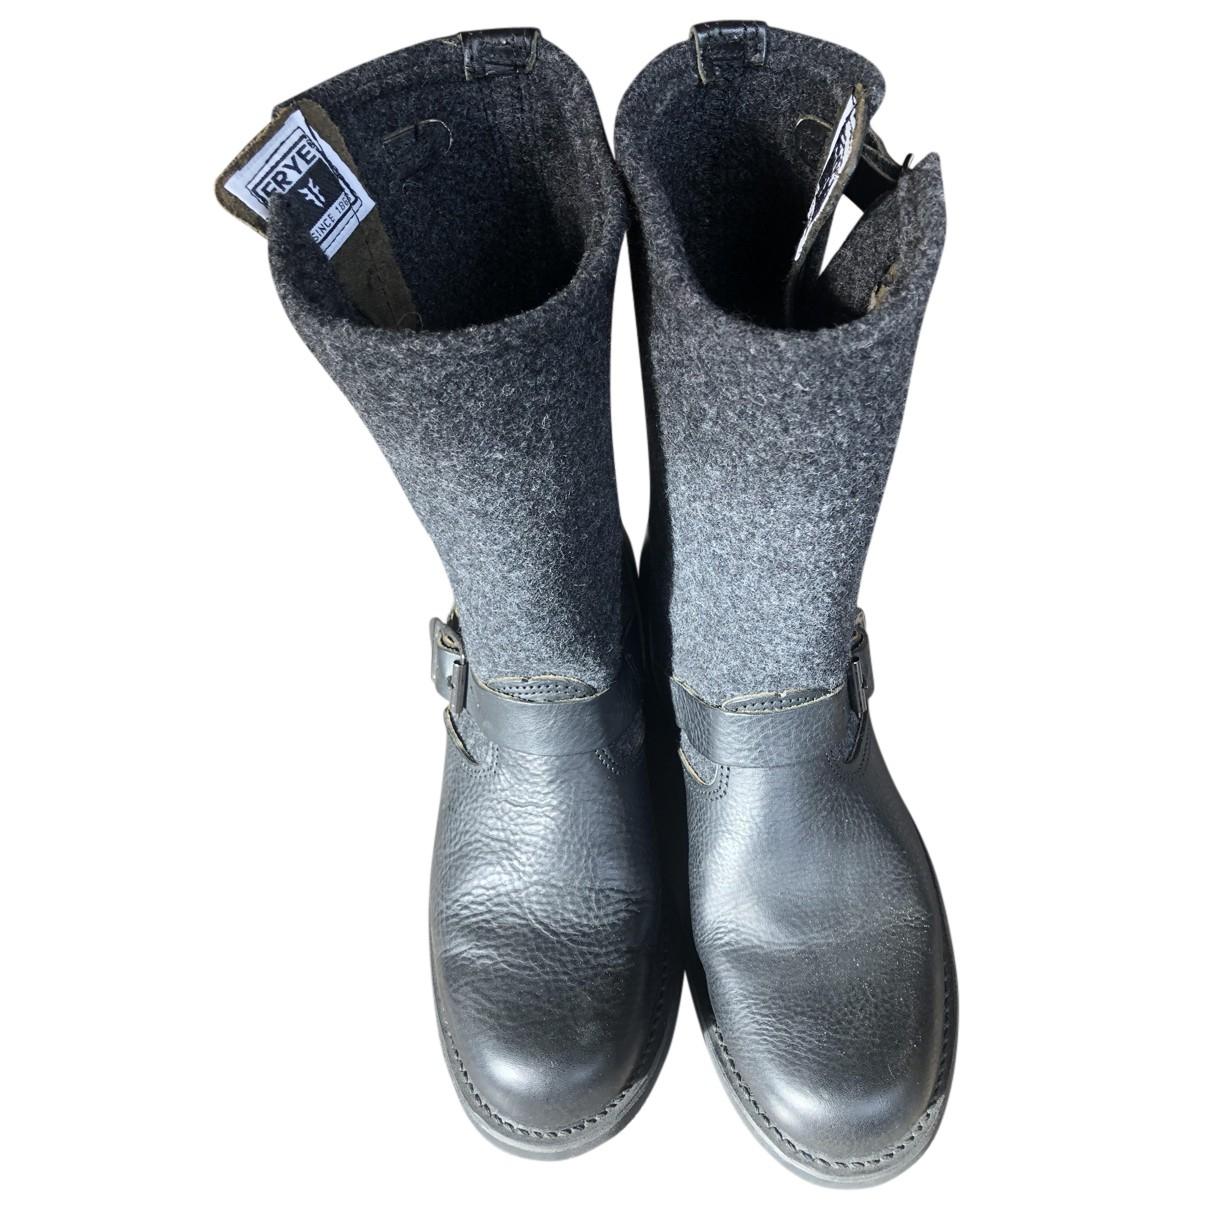 Frye N Black Leather Boots for Women 40 EU